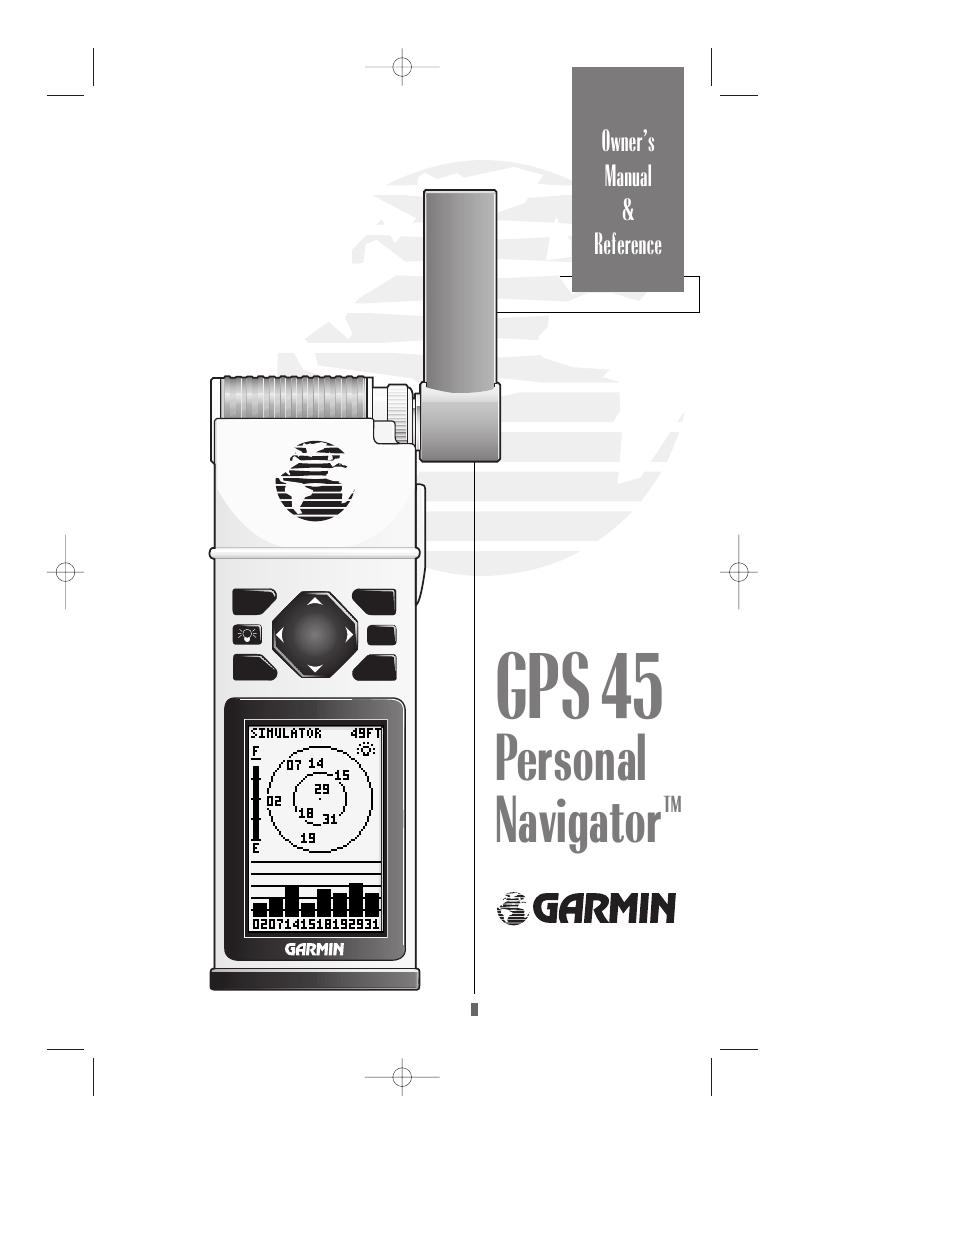 garmin gps 45 user manual 70 pages rh manualsdir com garmin gps 45 manual download garmin gps 45 manuale italiano